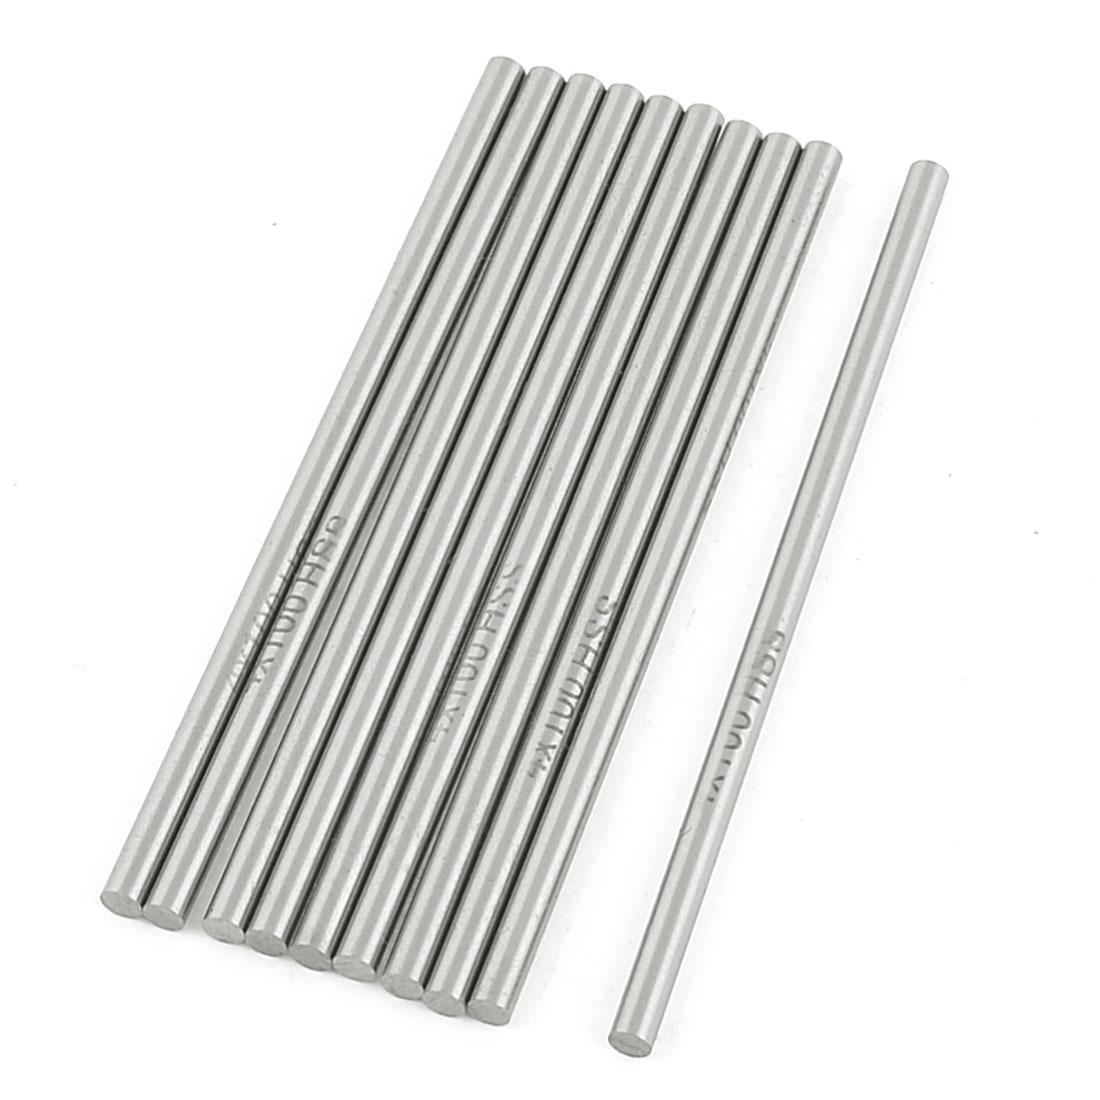 10 Pcs High Speed Steel Lathe Round Bar Rod Milling Cutter 4mm x 100mm